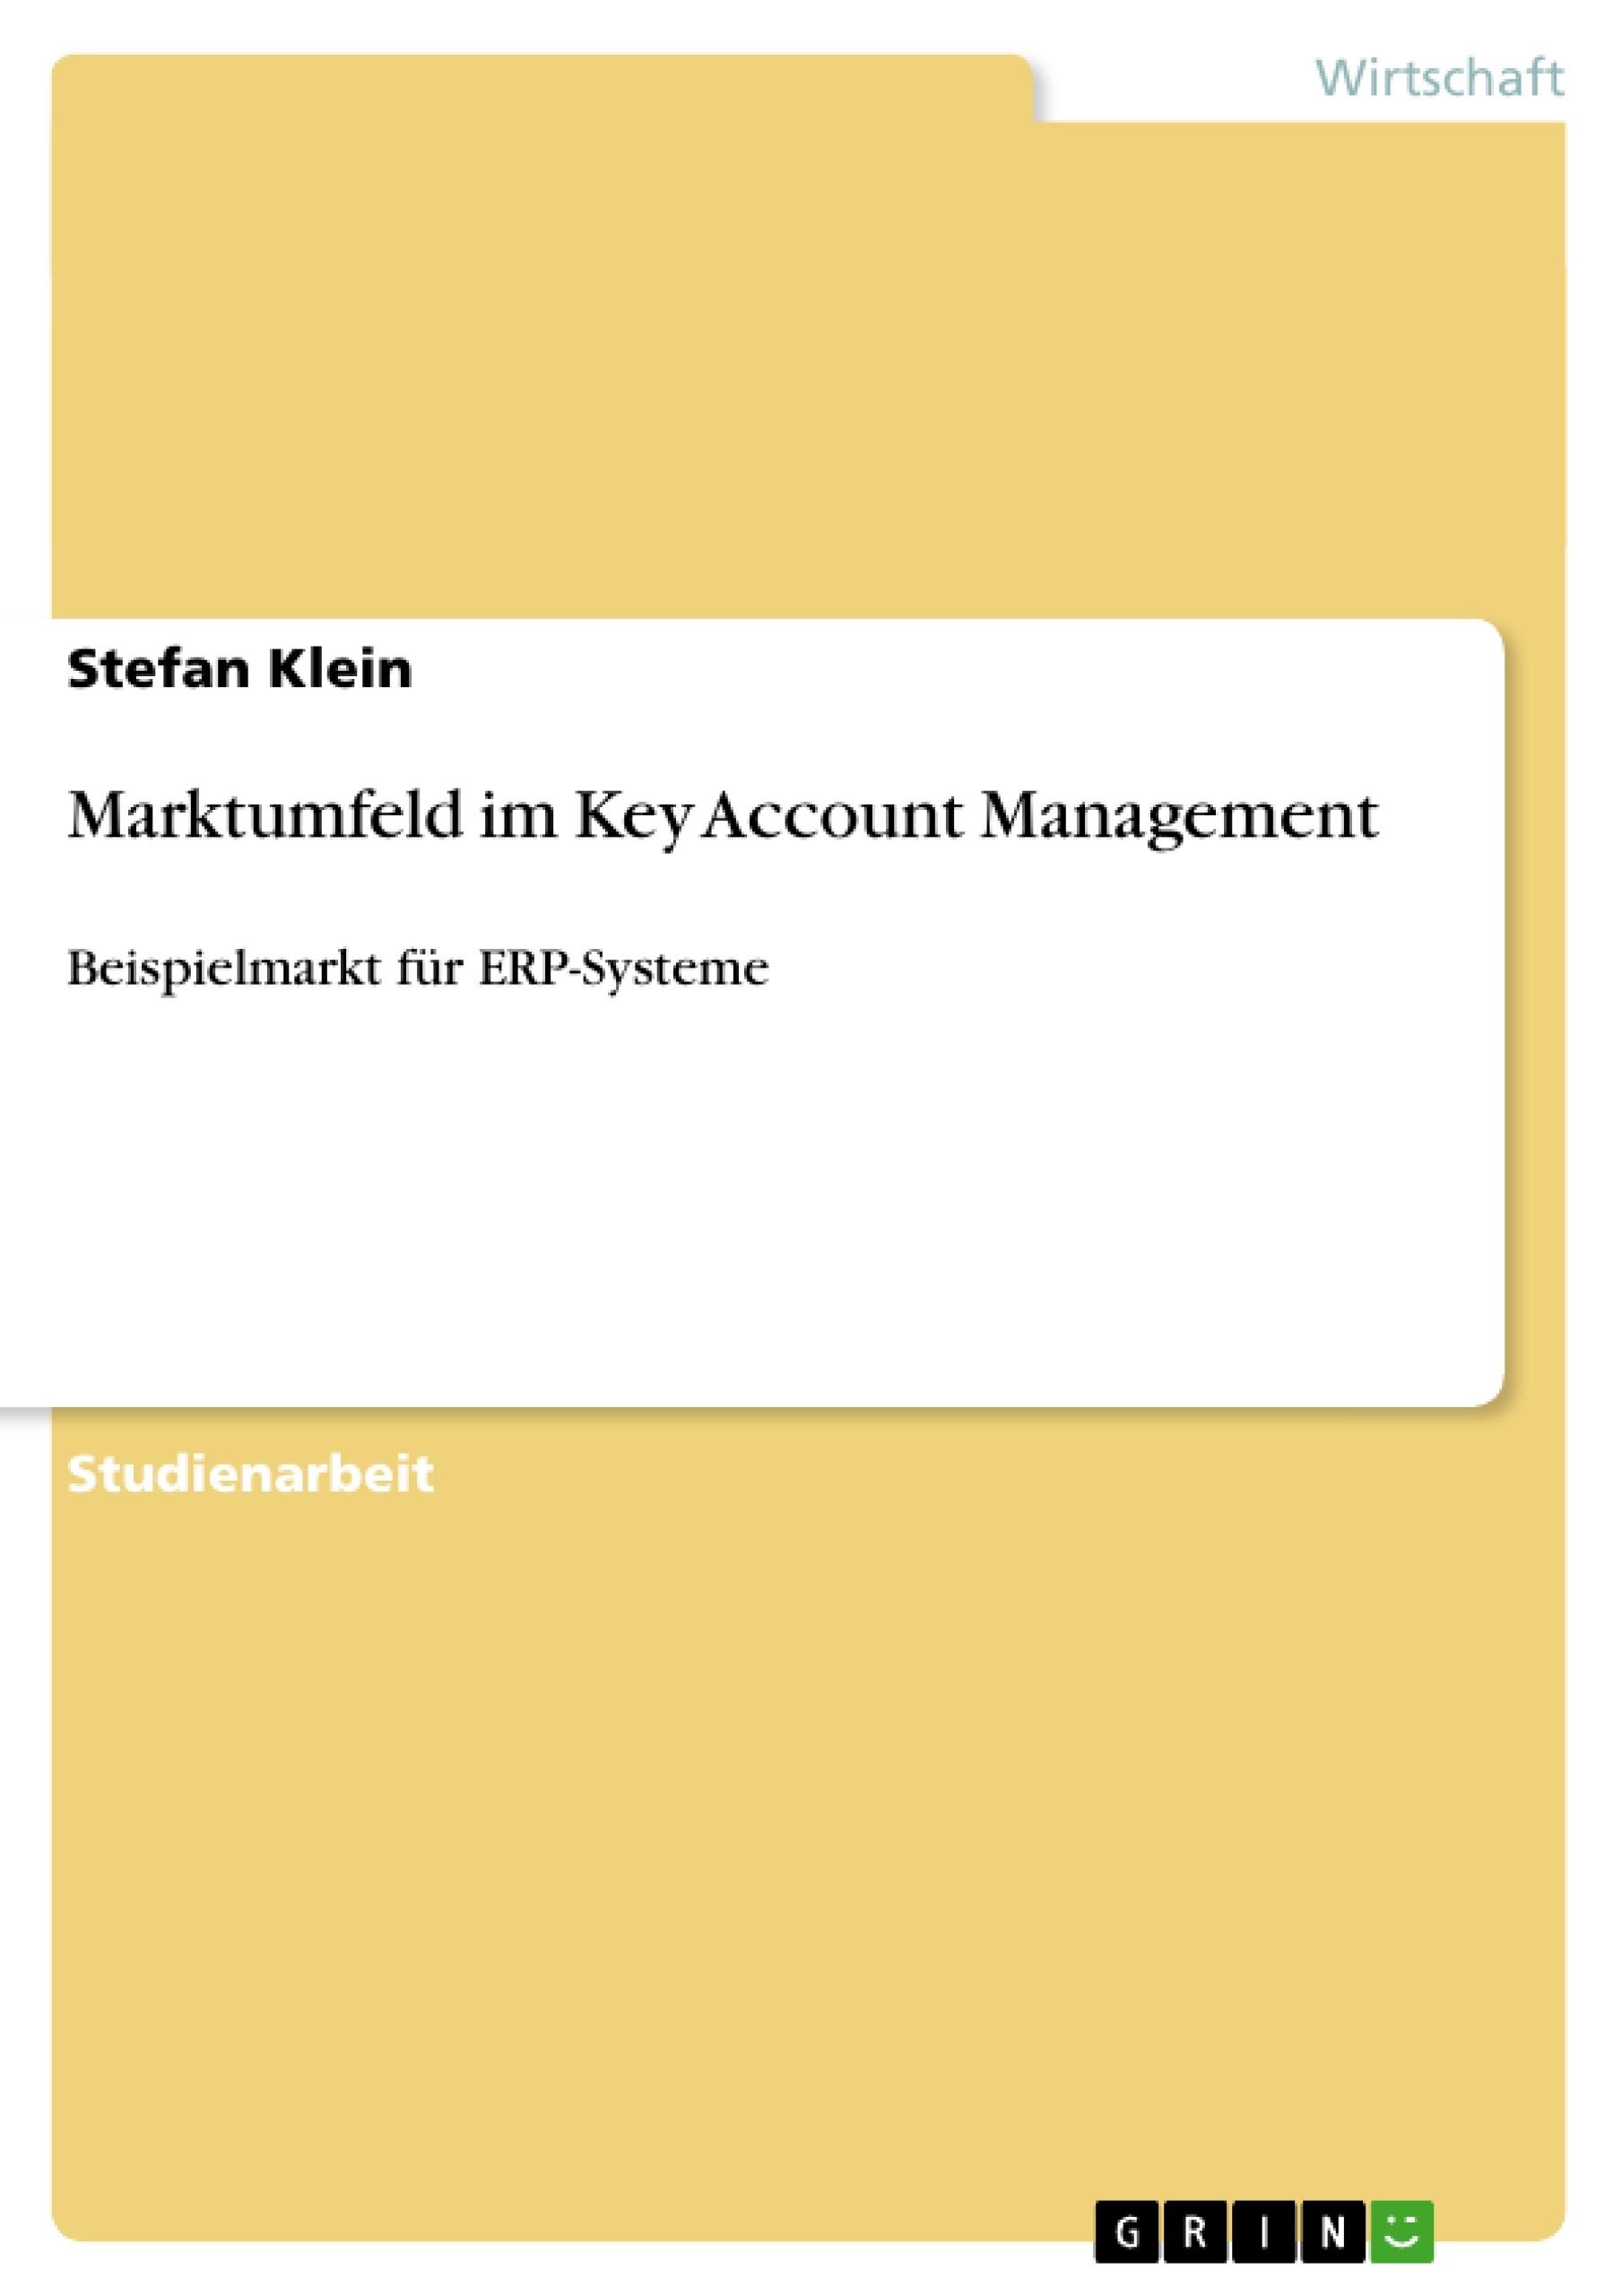 Titel: Marktumfeld im Key Account Management